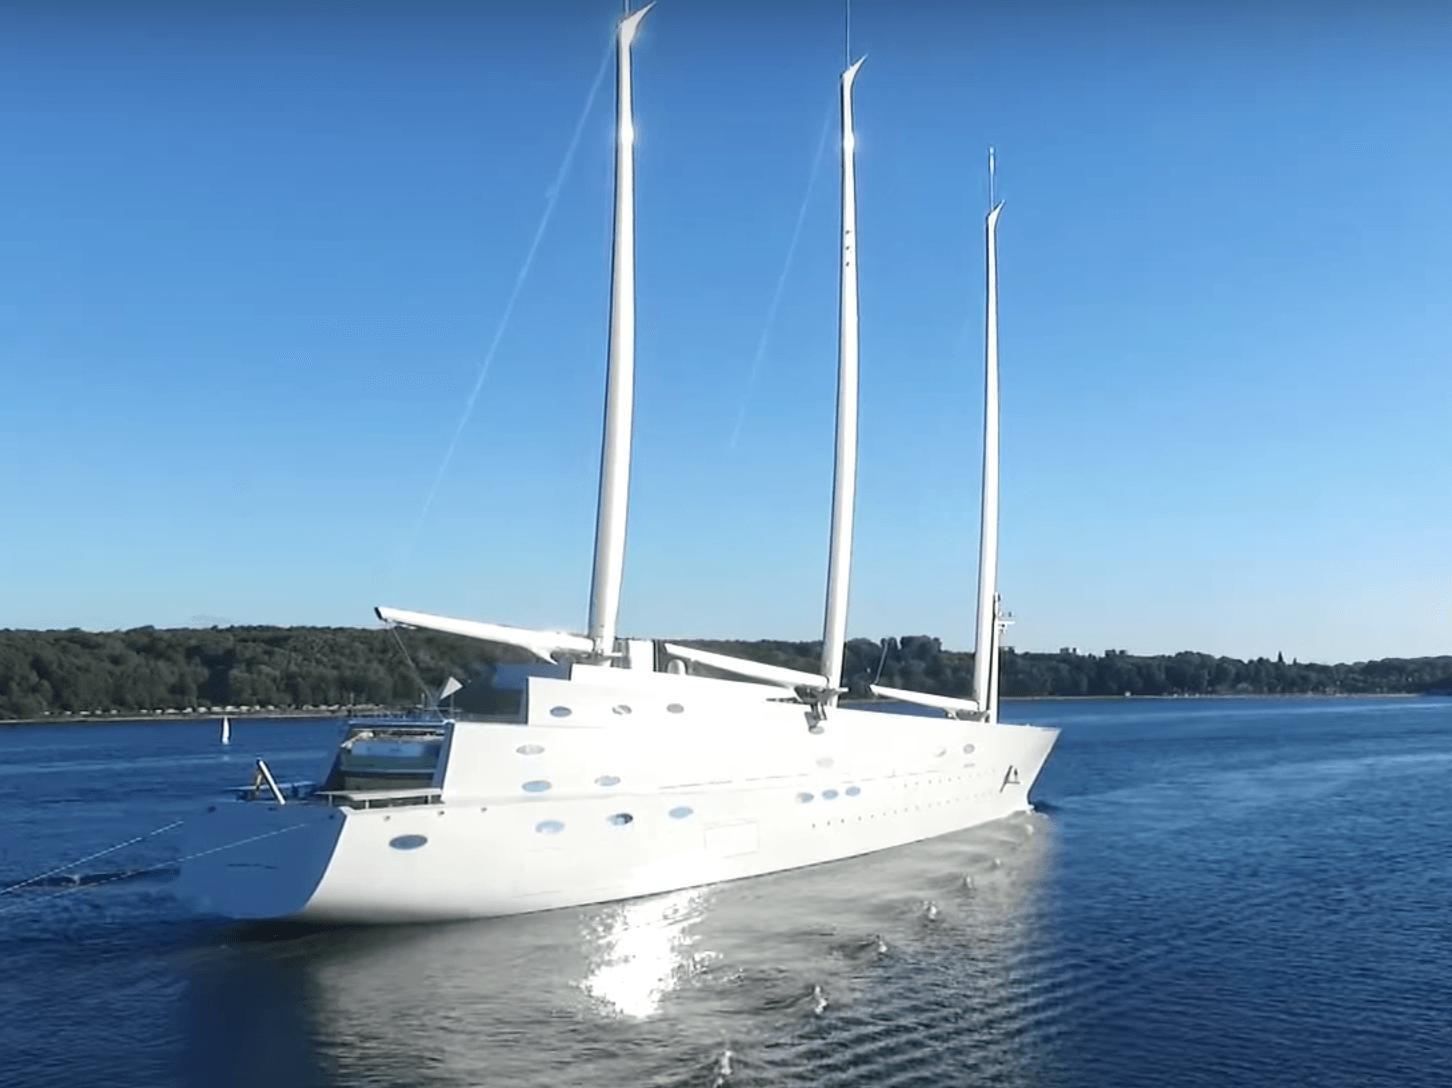 Superyacht Sunday 400 Million Sailing Yacht A 6 Cool Facts